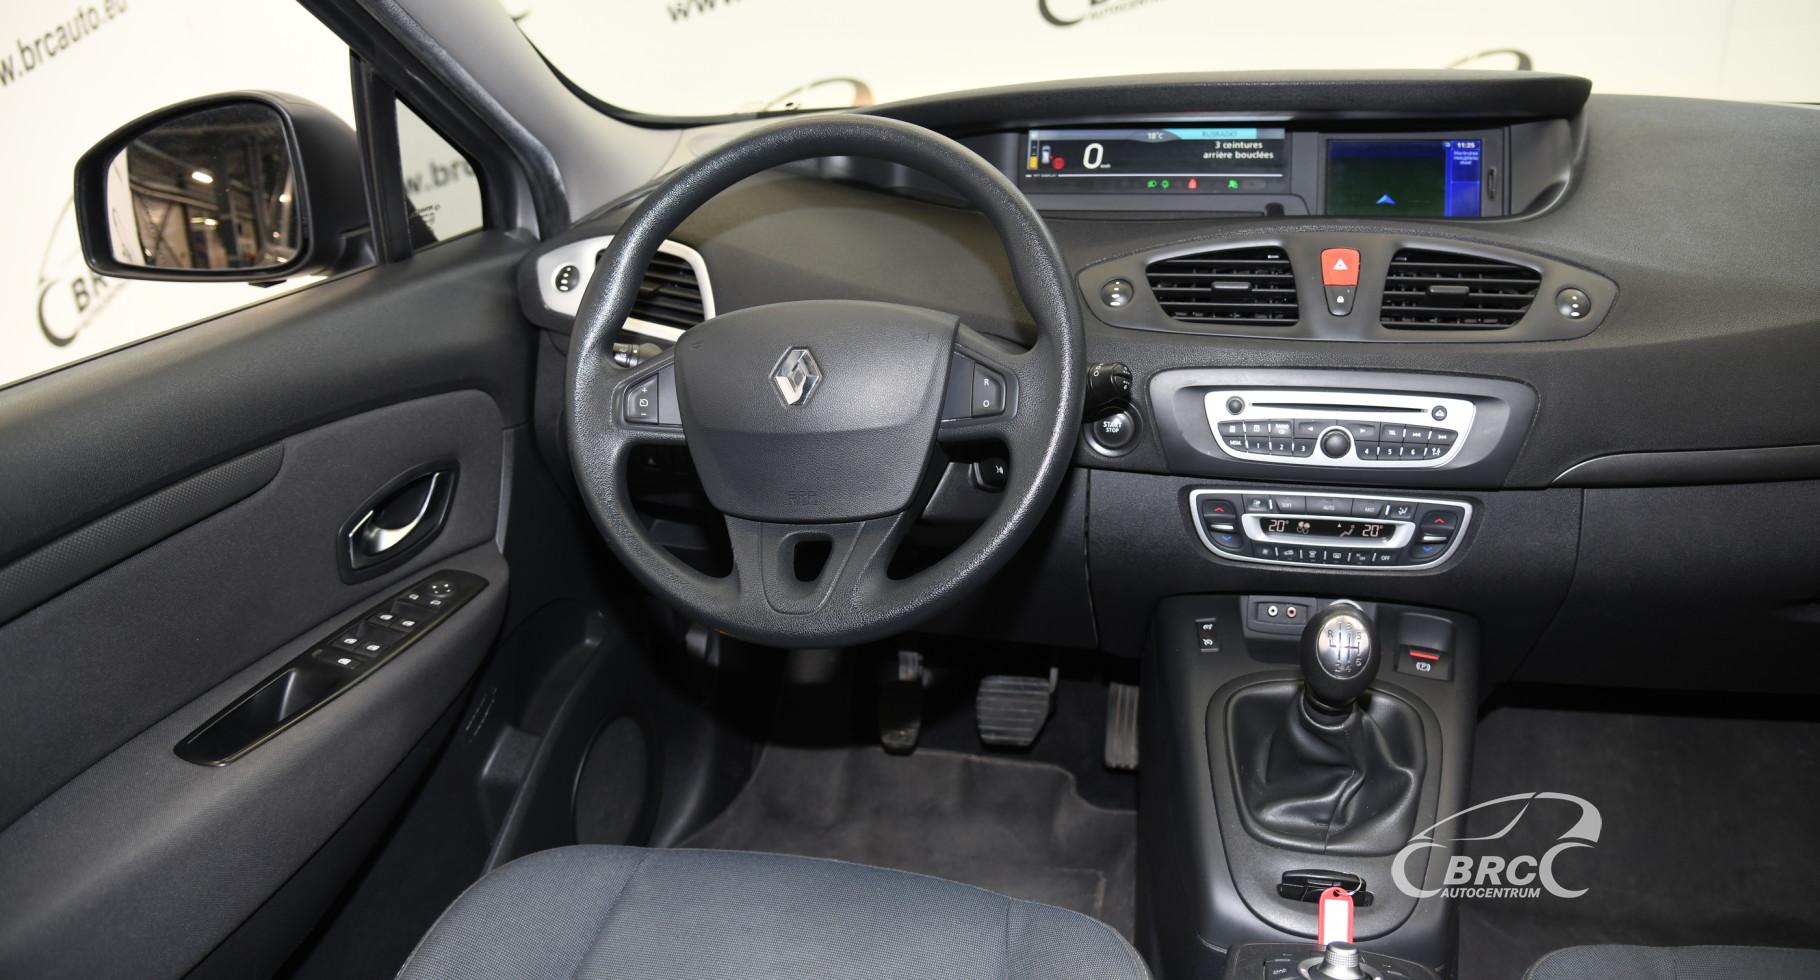 Renault Megane Scenic 1.5 dci